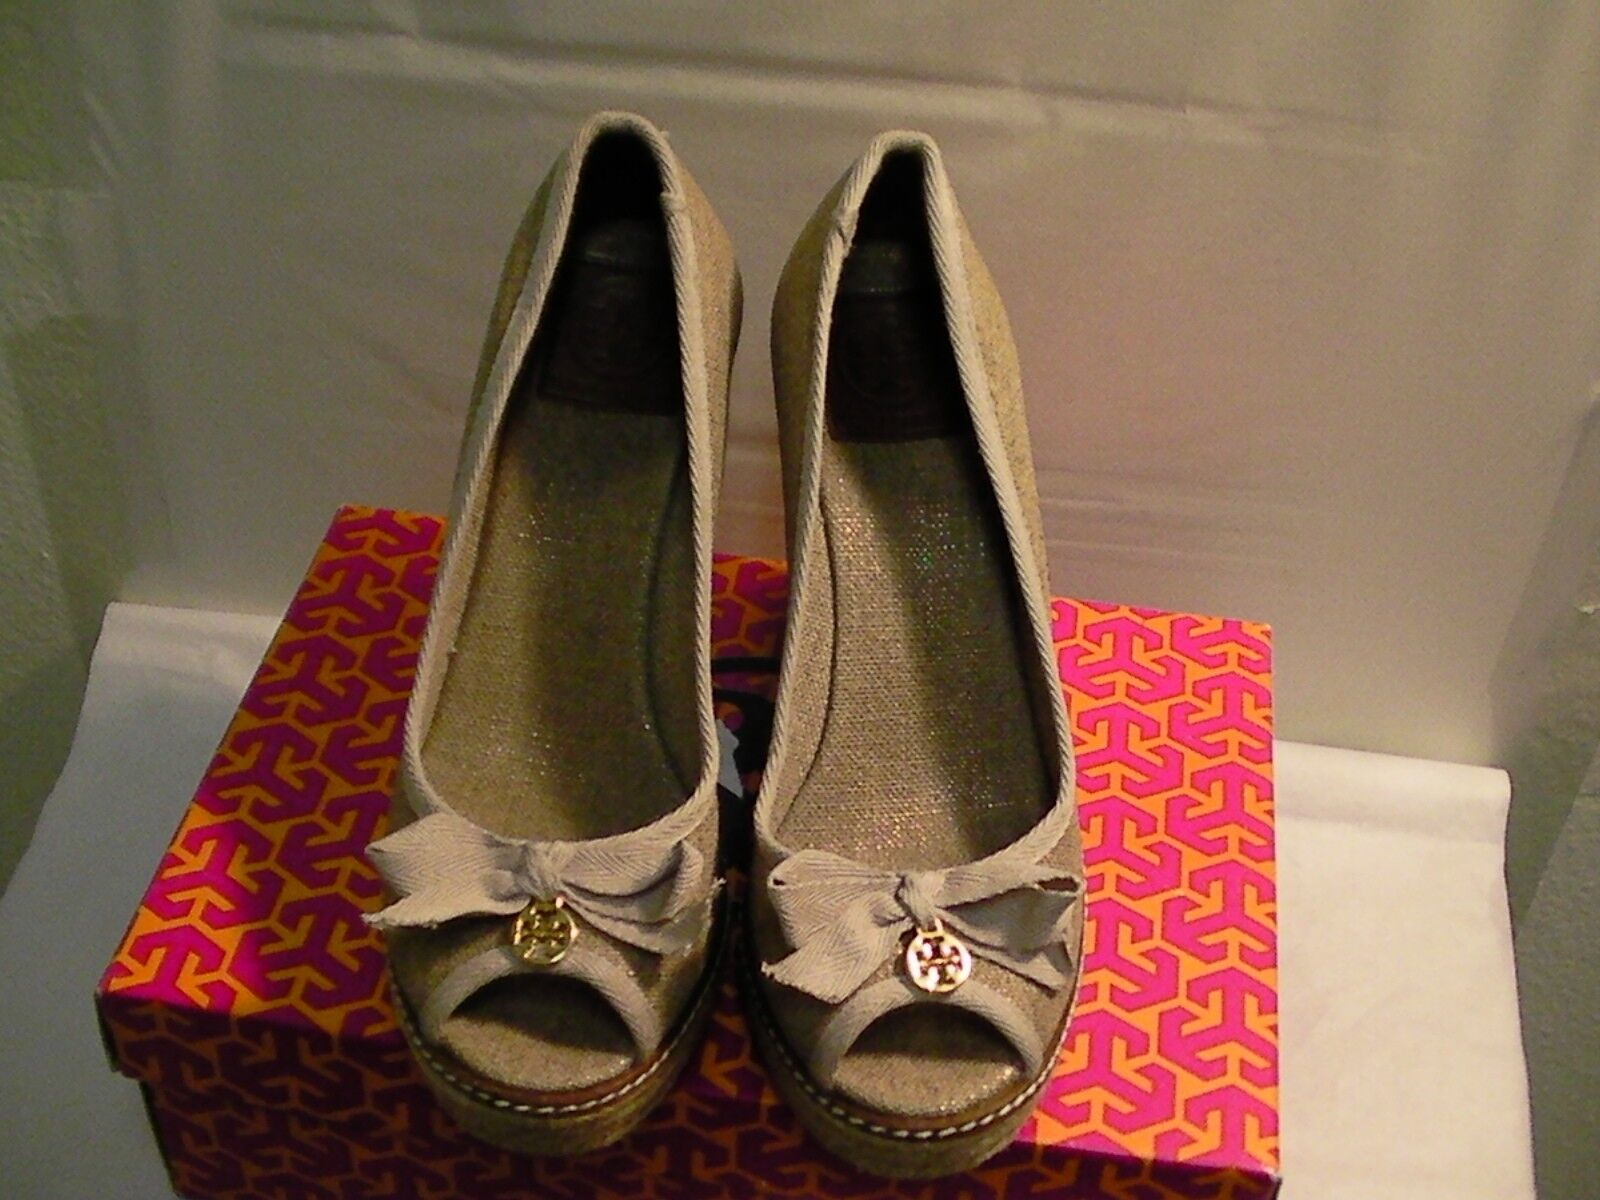 Scarpe da Tory Burch da donna  Jackie 110 MM cuneo 11 B  sport dello shopping online